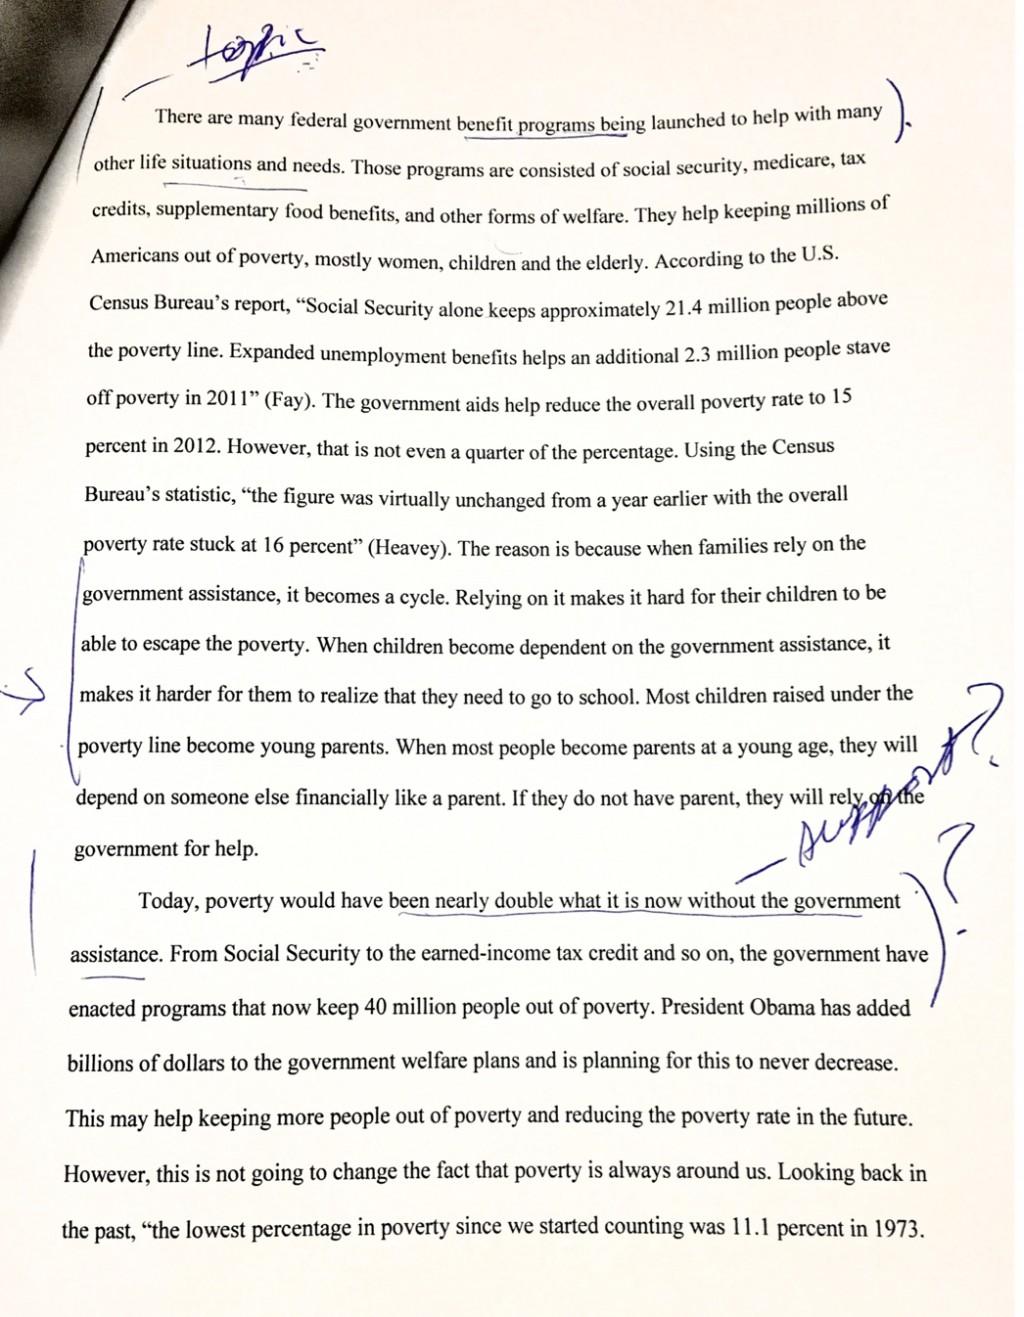 001 Fix My Essay Singular Generator Free Title Online Large